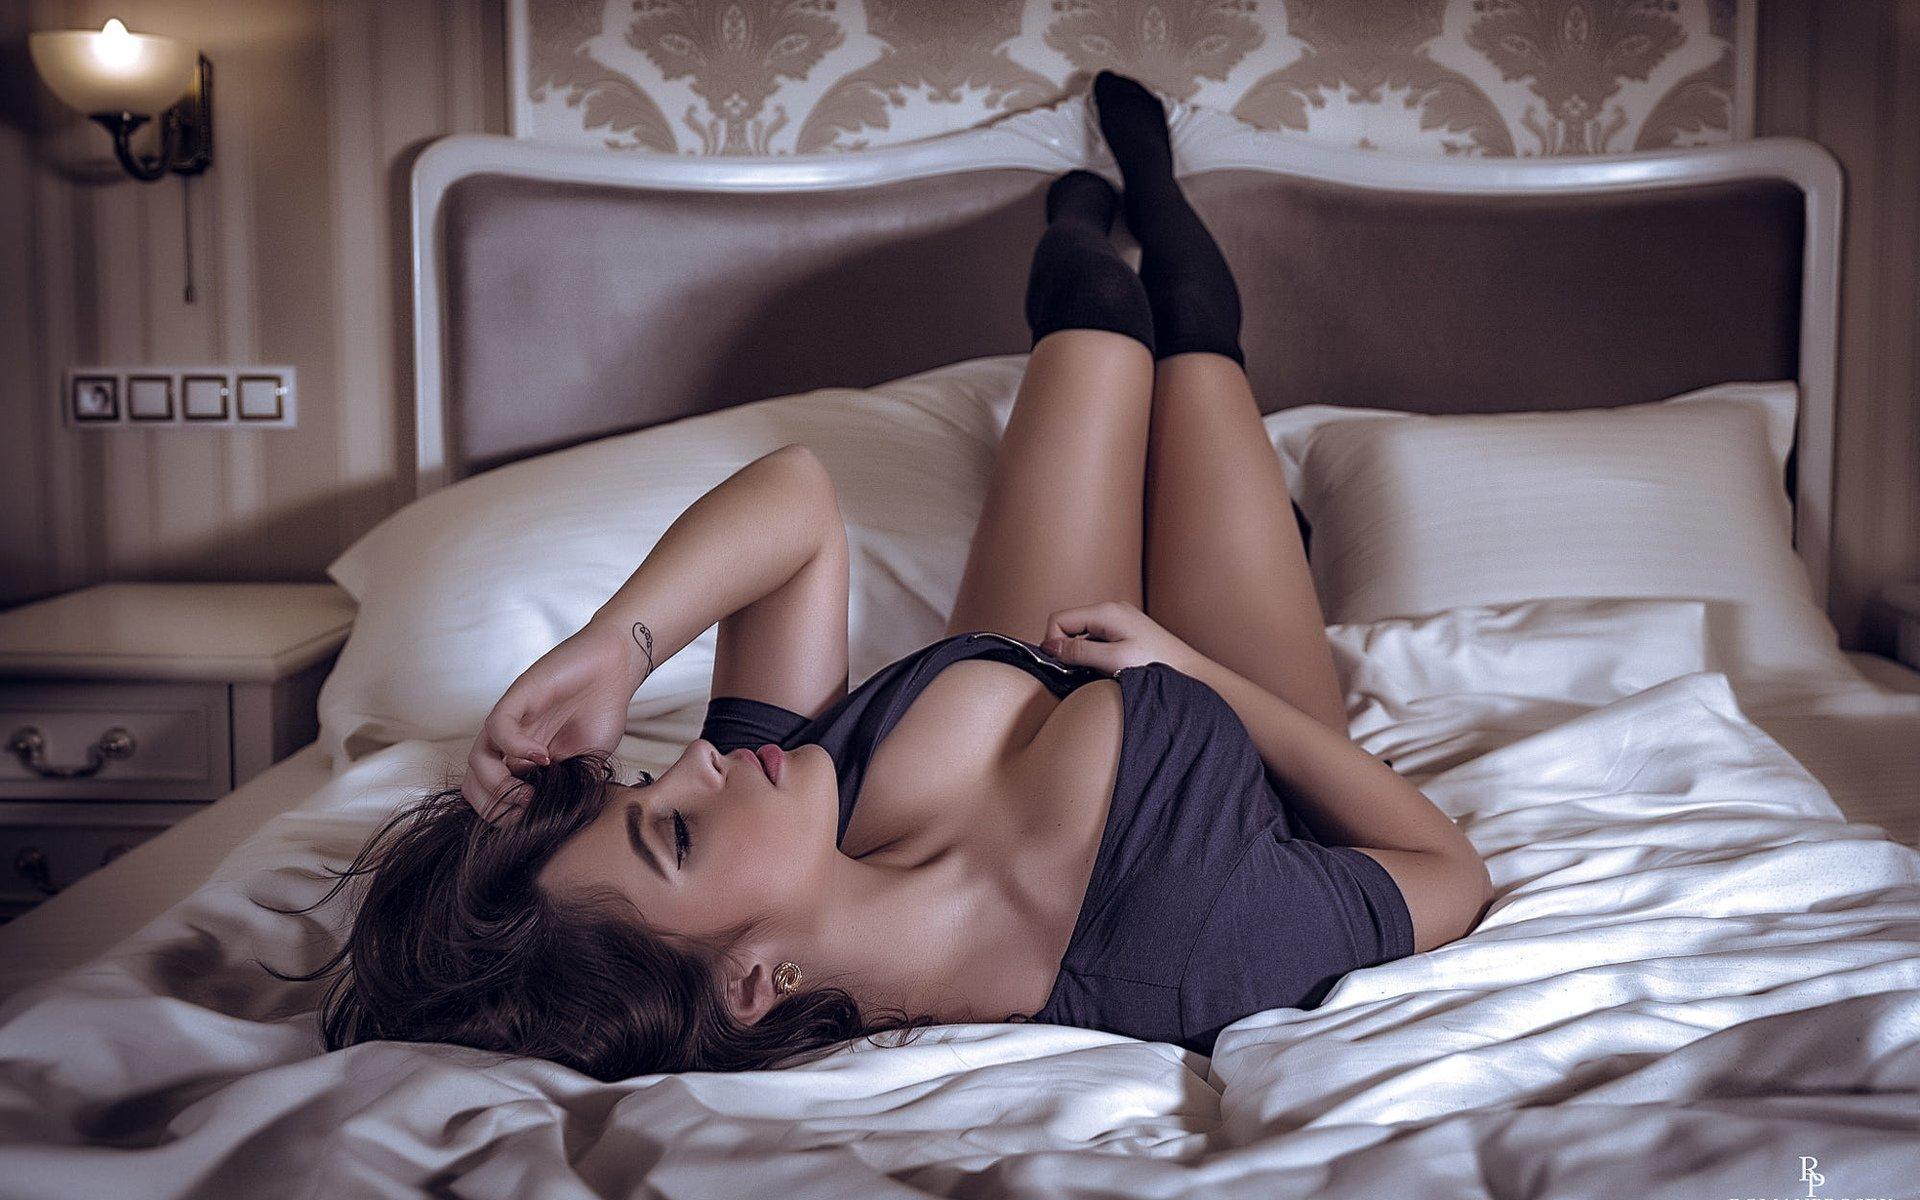 Lingam massage - new technology in the erotic massage salon